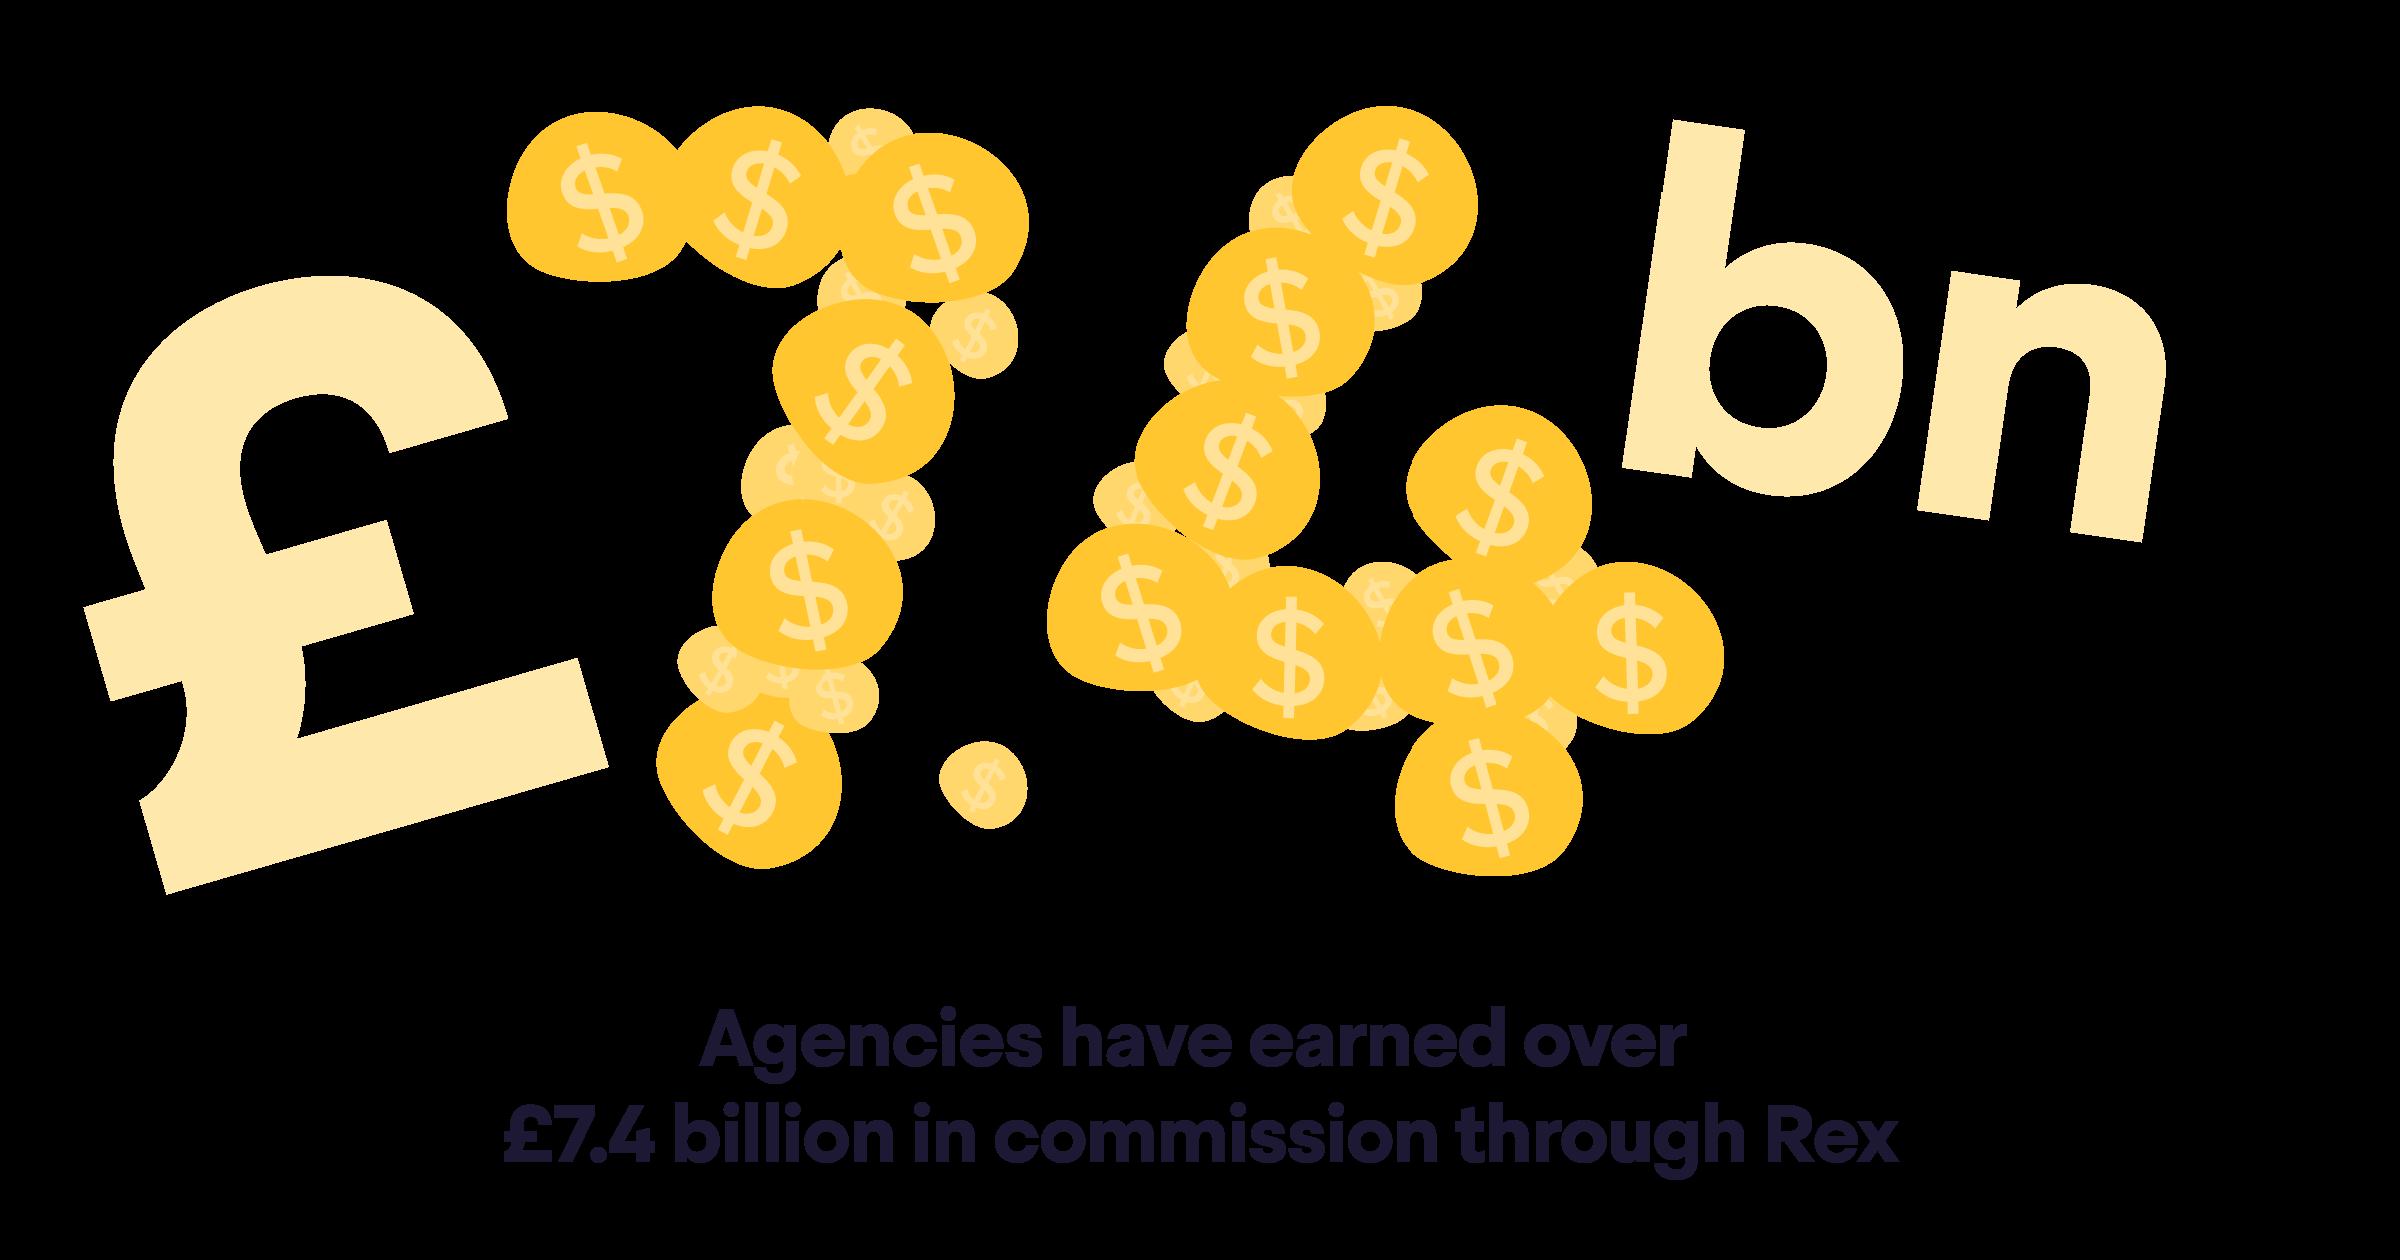 7.4 billion pounds in commission through rex